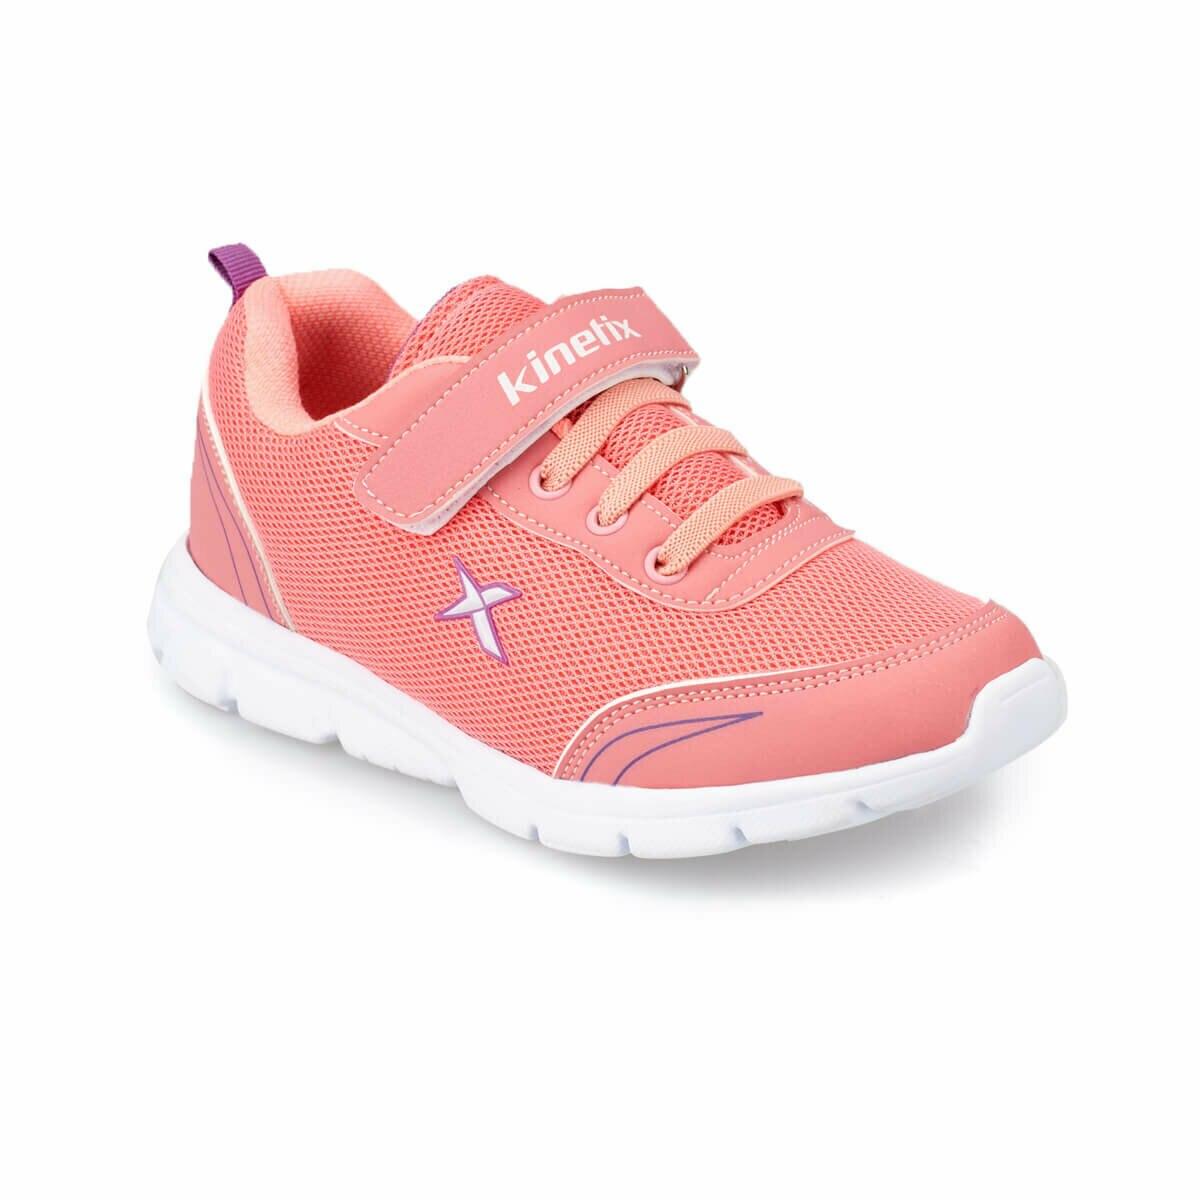 FLO YANNI Coral Female Child Walking Shoes KINETIX